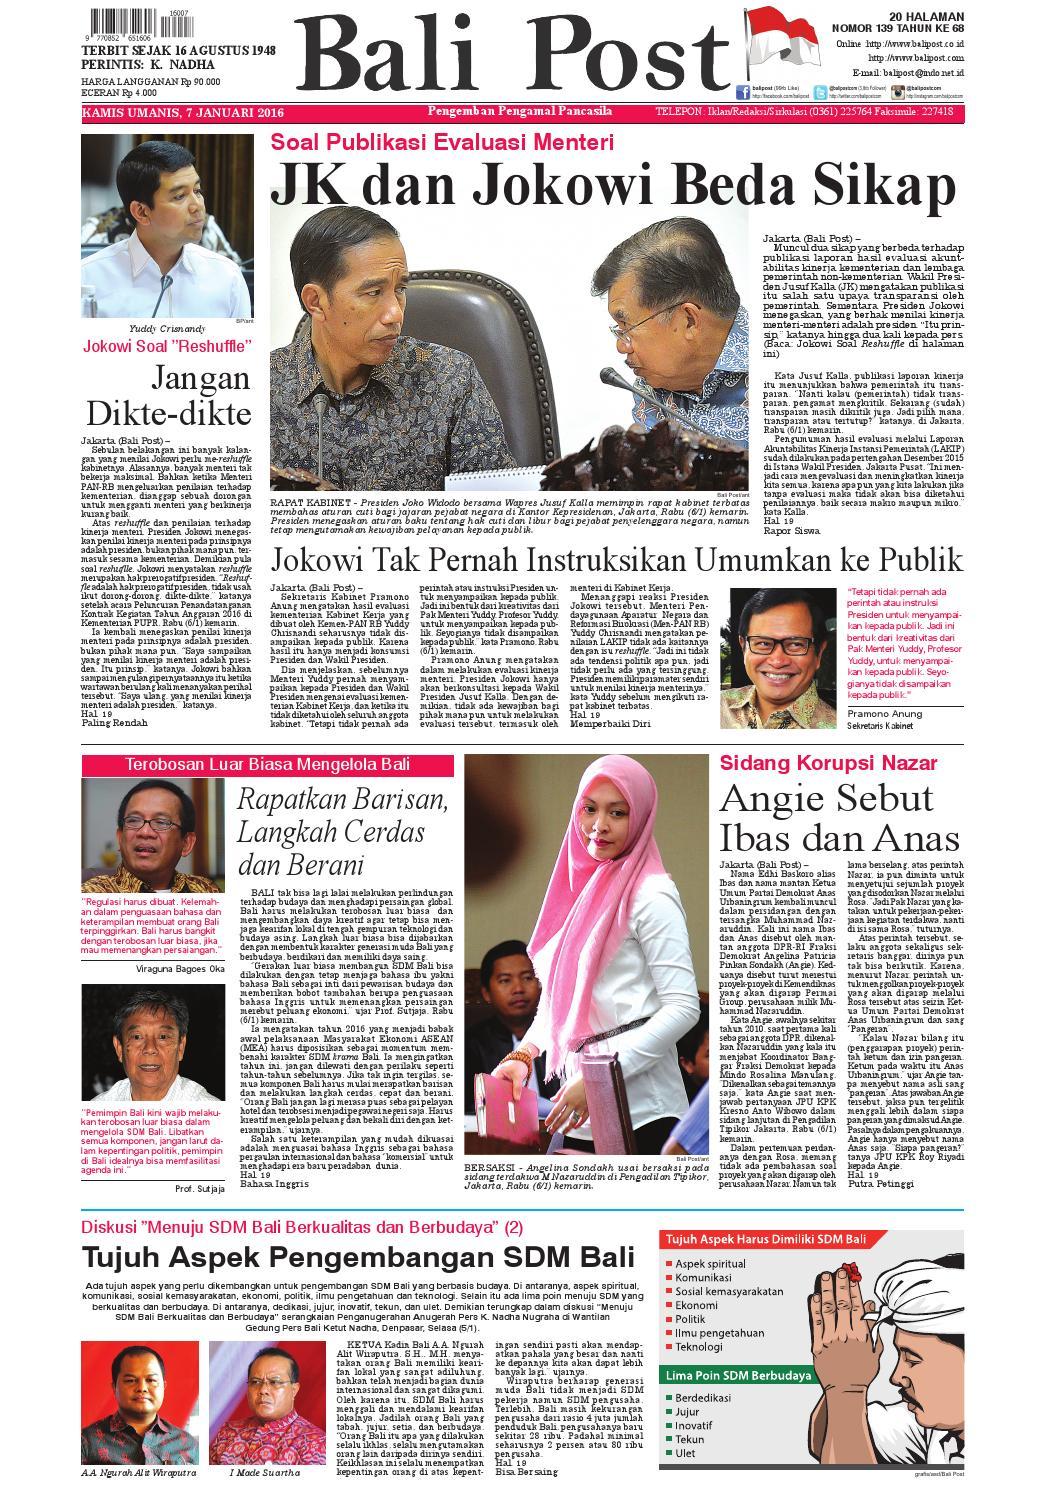 Edisi 07 Januari 2016 Balipostcom By E Paper Kmb Issuu Produk Ukm Bumn Tenun Pagatan Kemeja Pria Biru Kapal